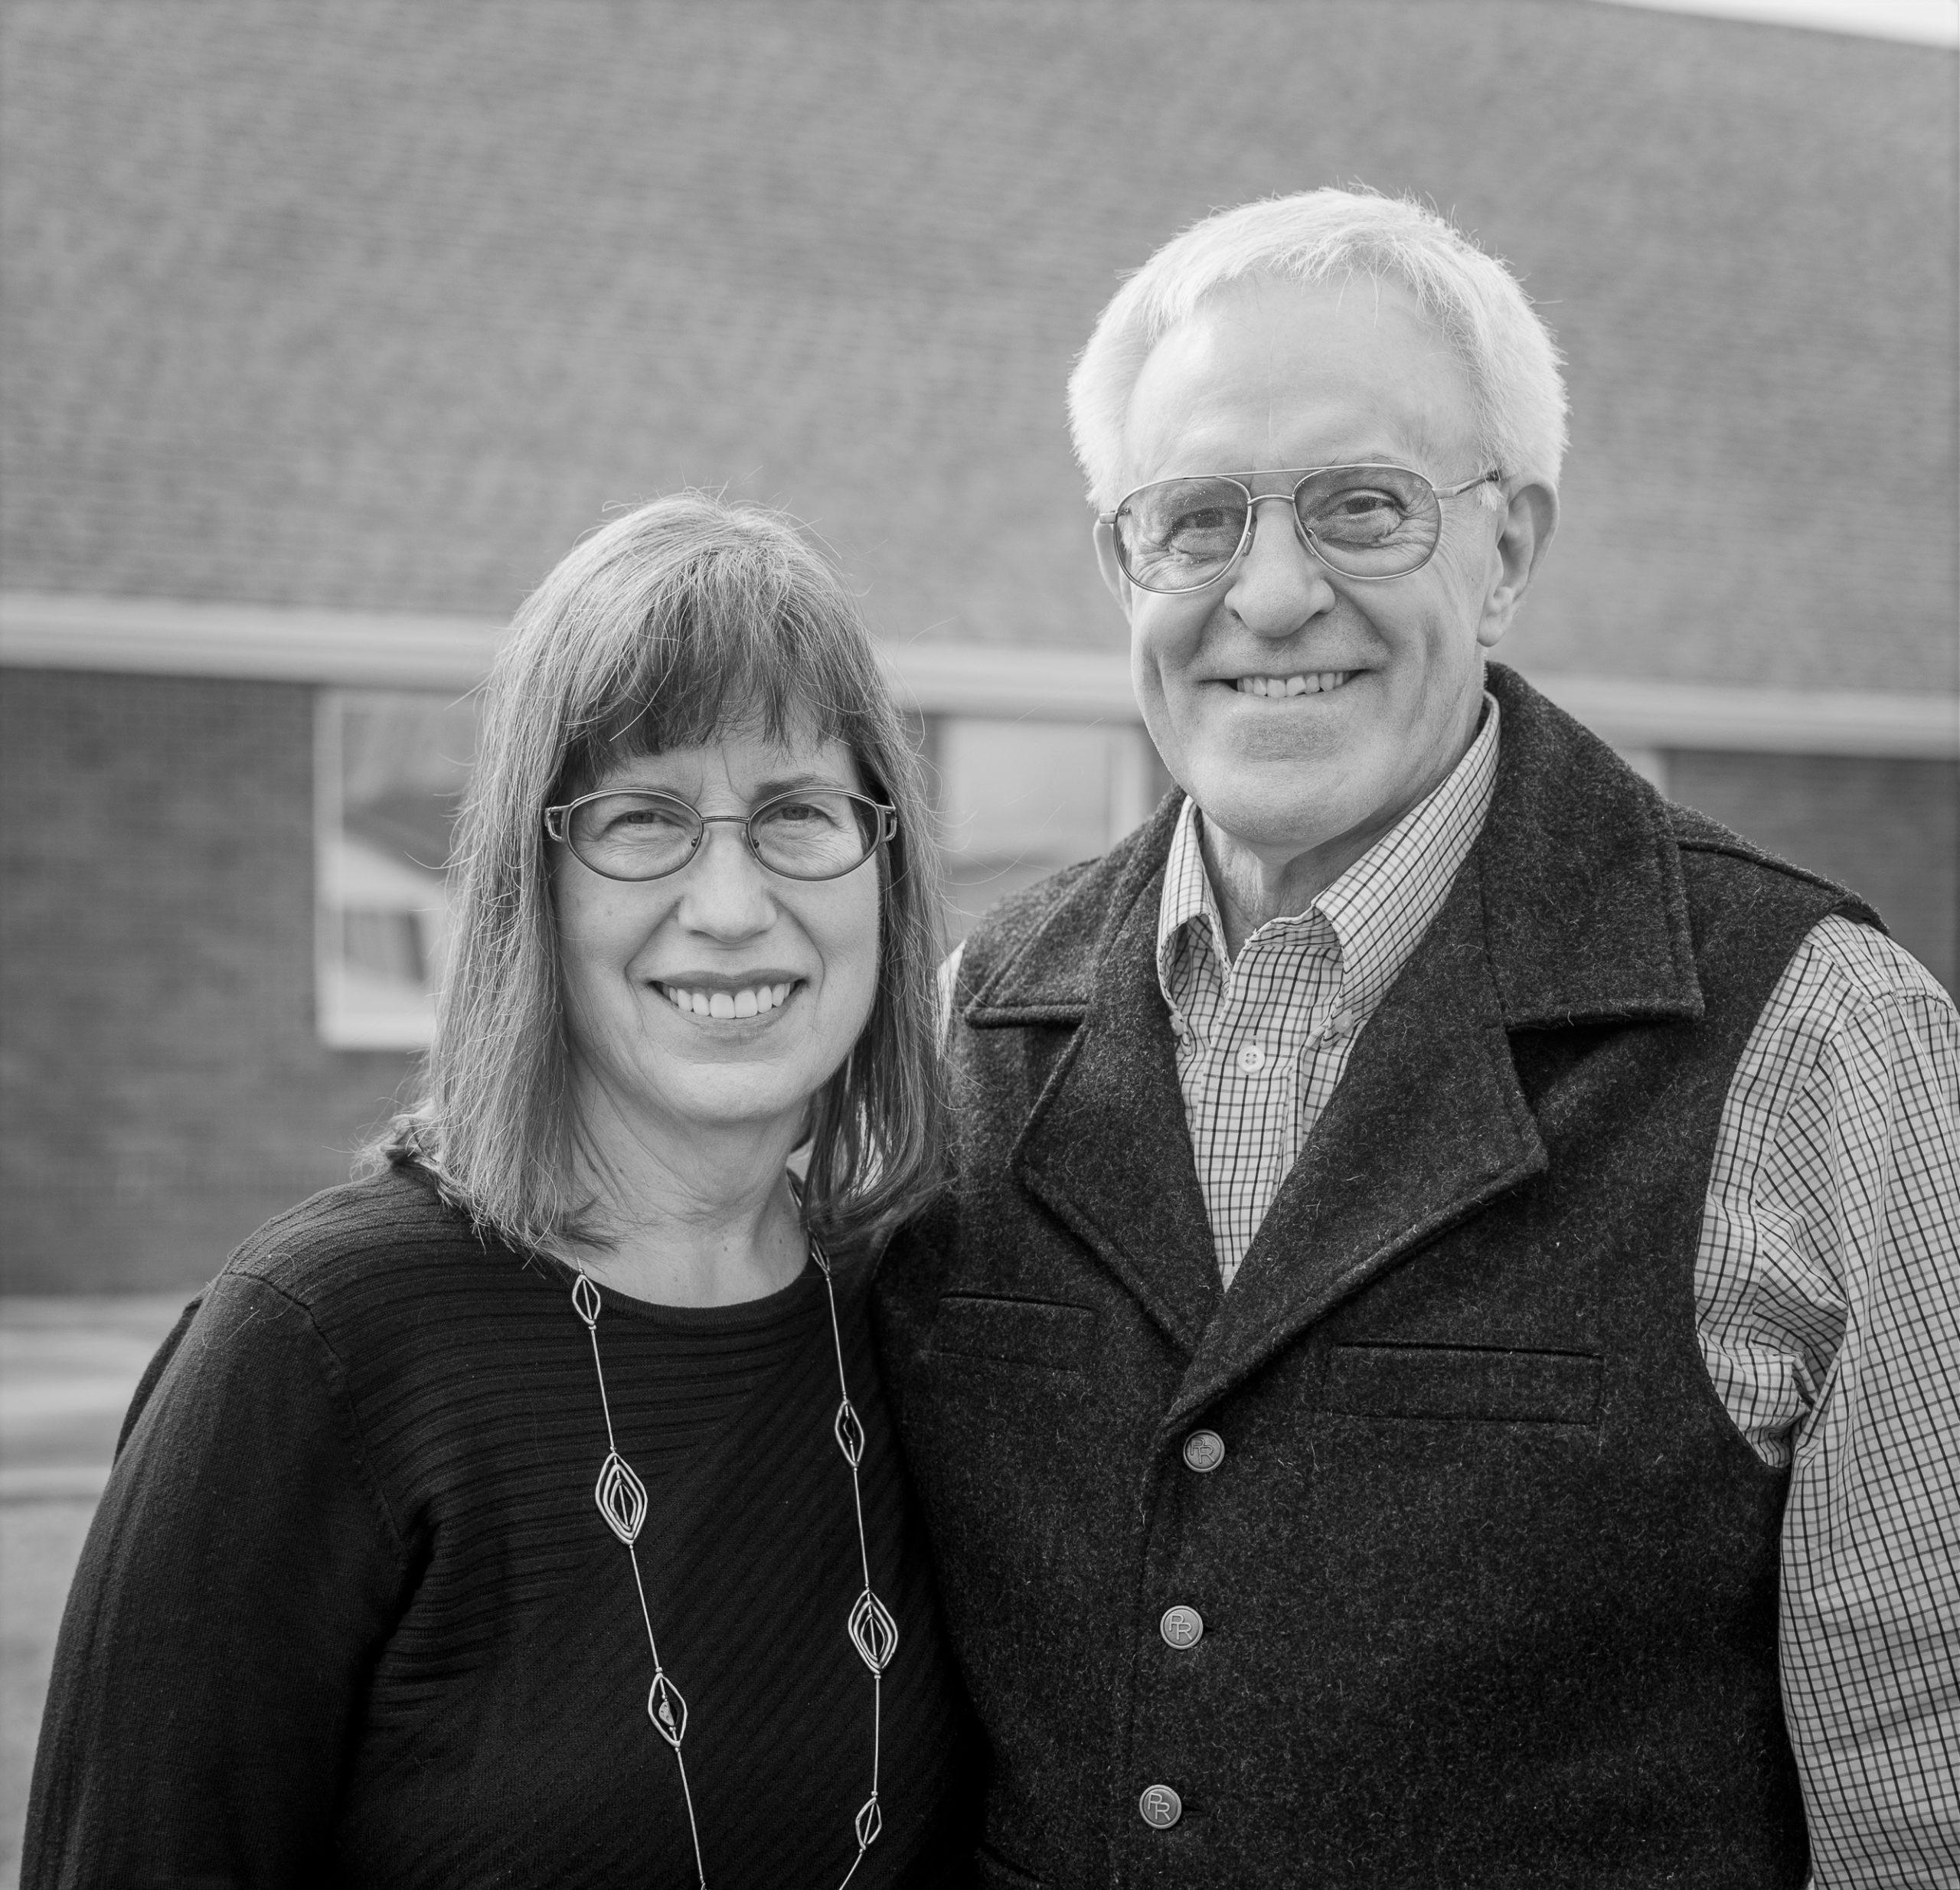 Rick Lavold, Board Member/ Pastoral Care at Faith Family Billings Church, Billings, MT